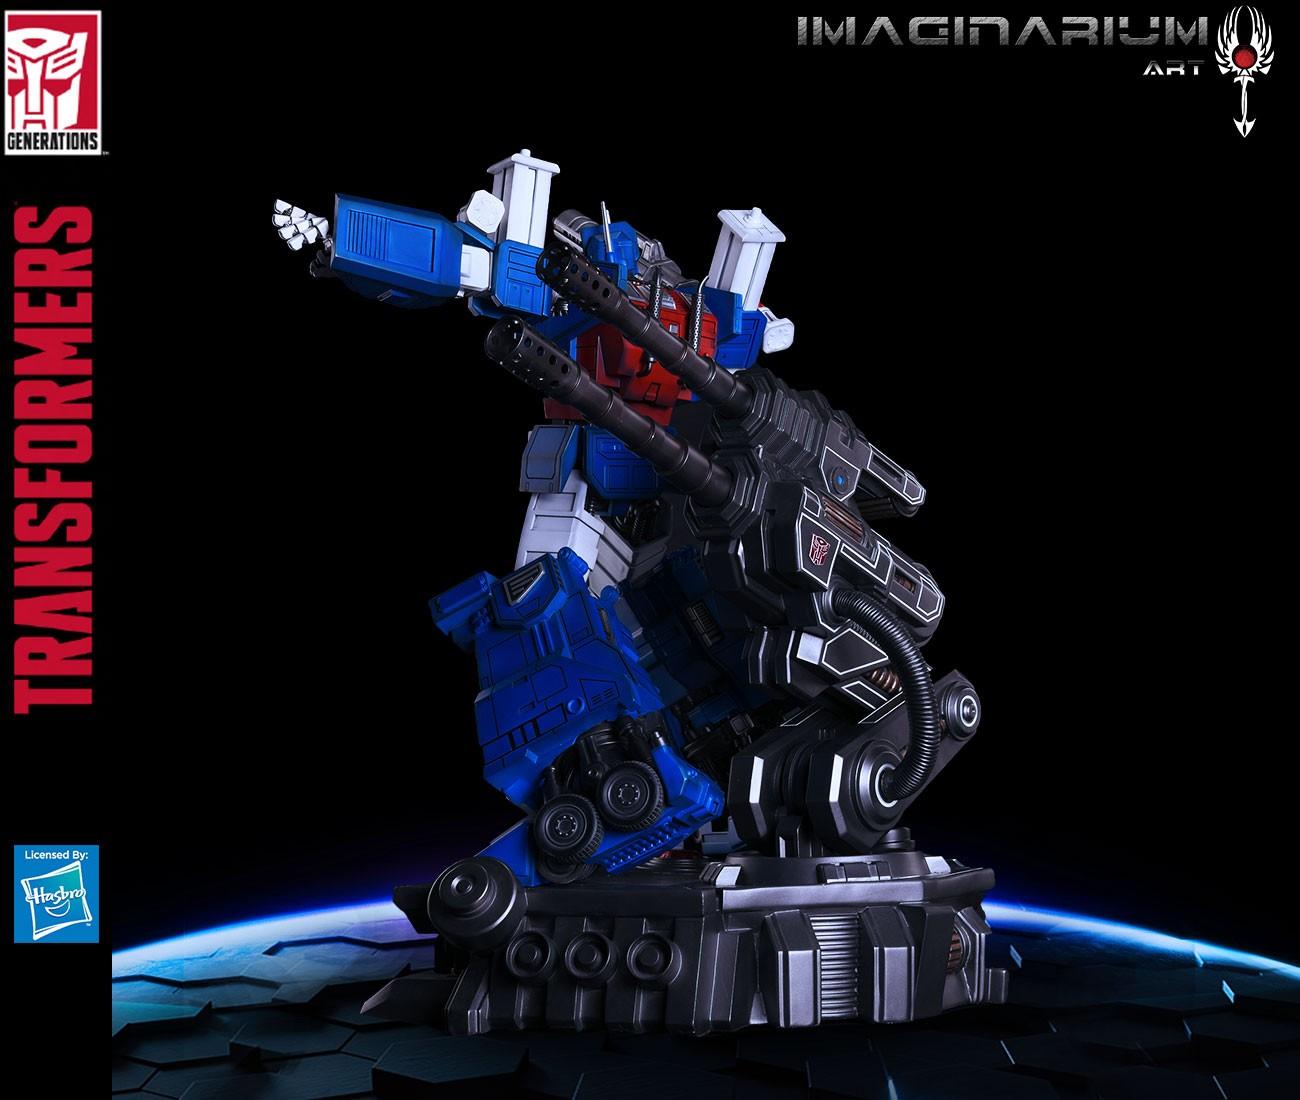 Transformers News: New Images of Imaginarium Art Transformers Ultra Magnus Statue